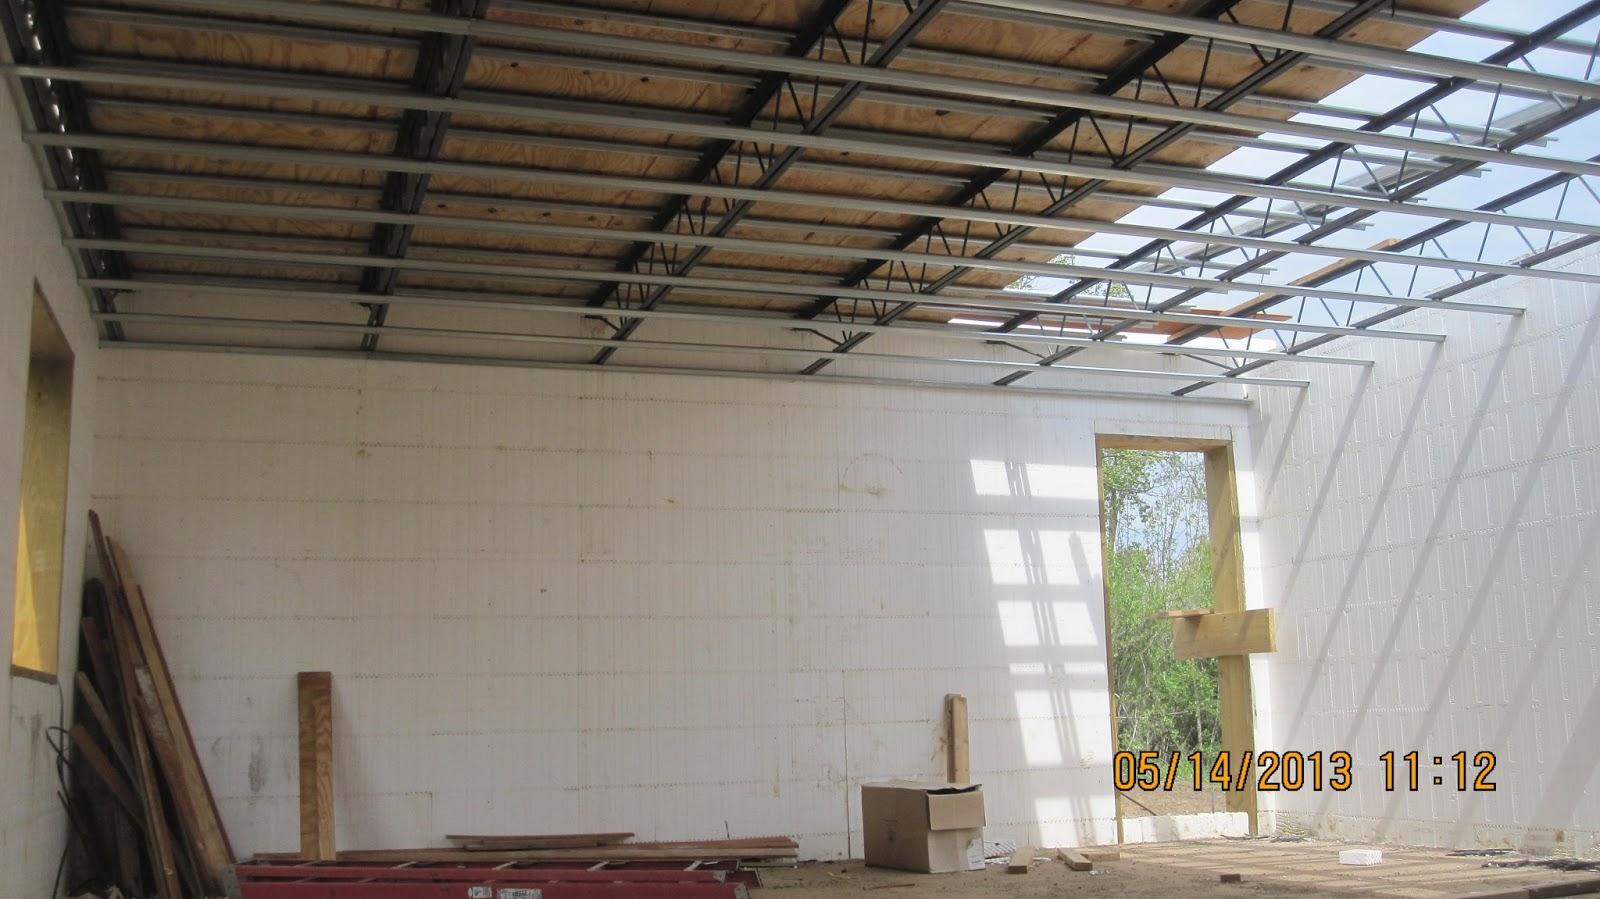 Energy efficient building network first floor structure for Icf floor